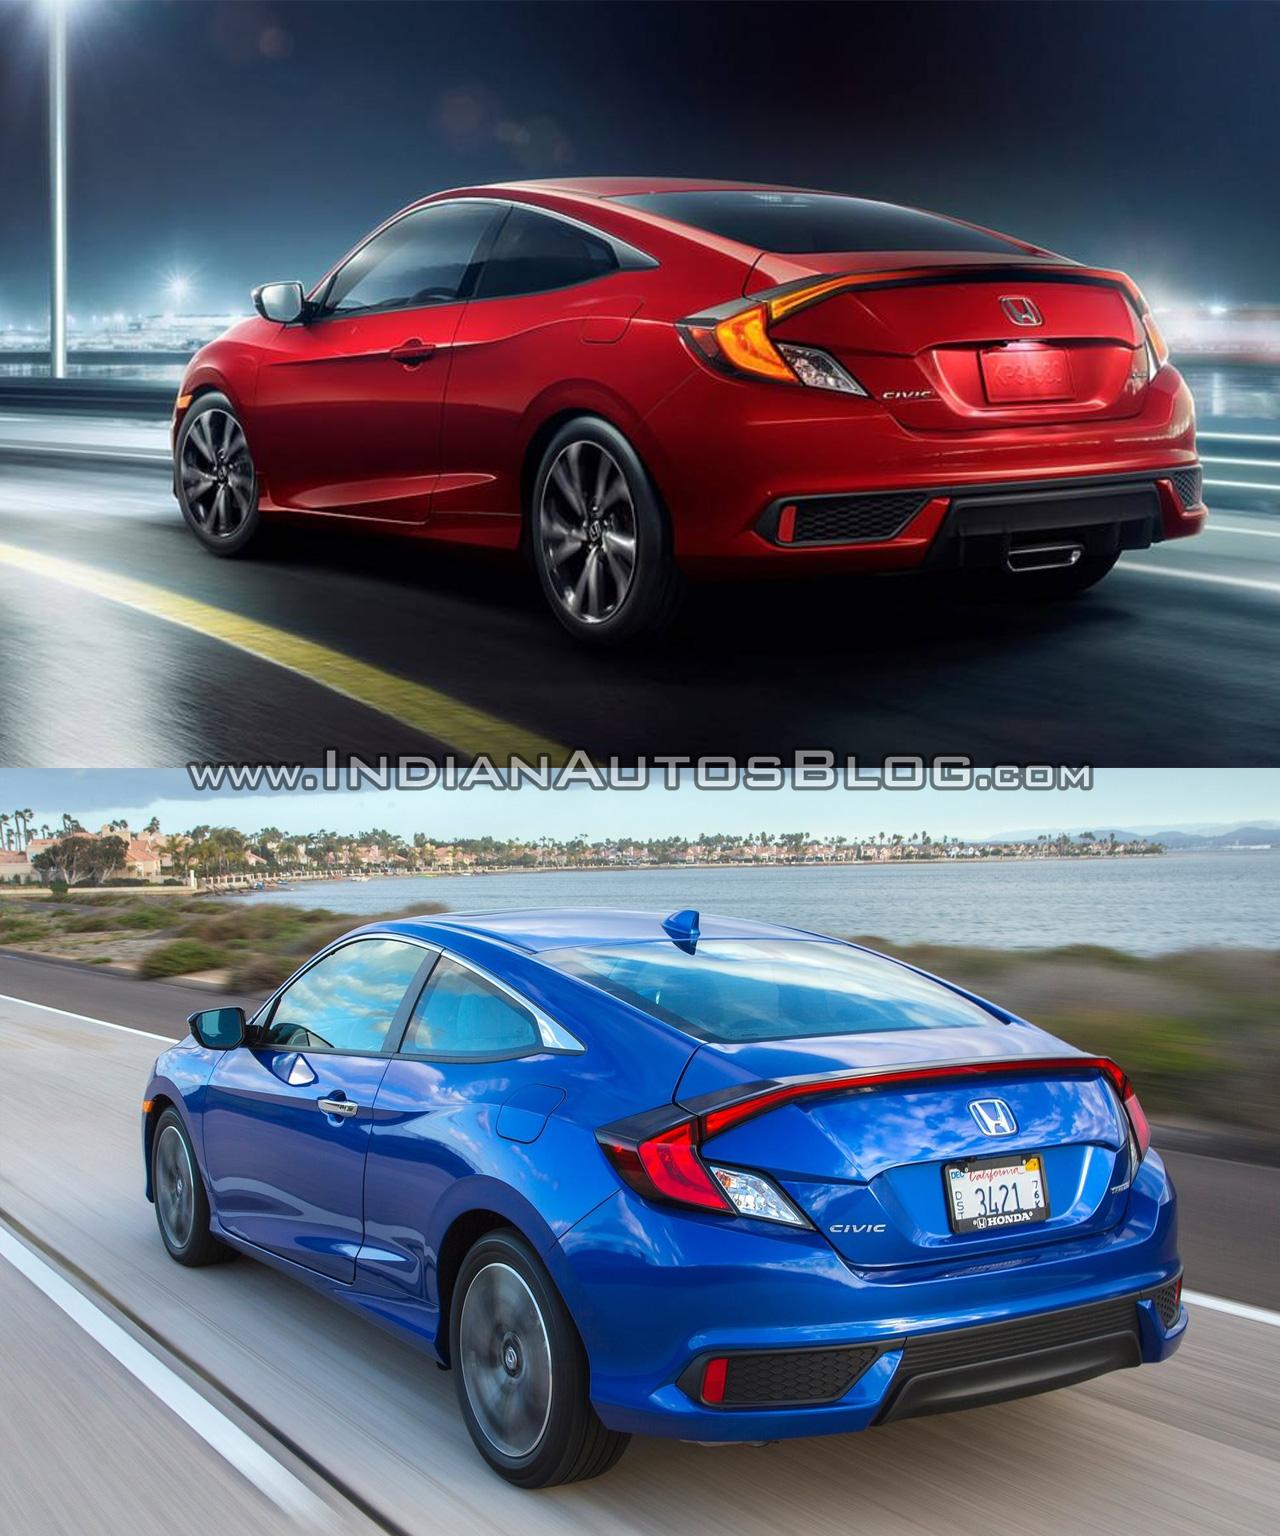 Honda Civic Coupe: 2019 Honda Civic Vs. 2016 Honda Civic